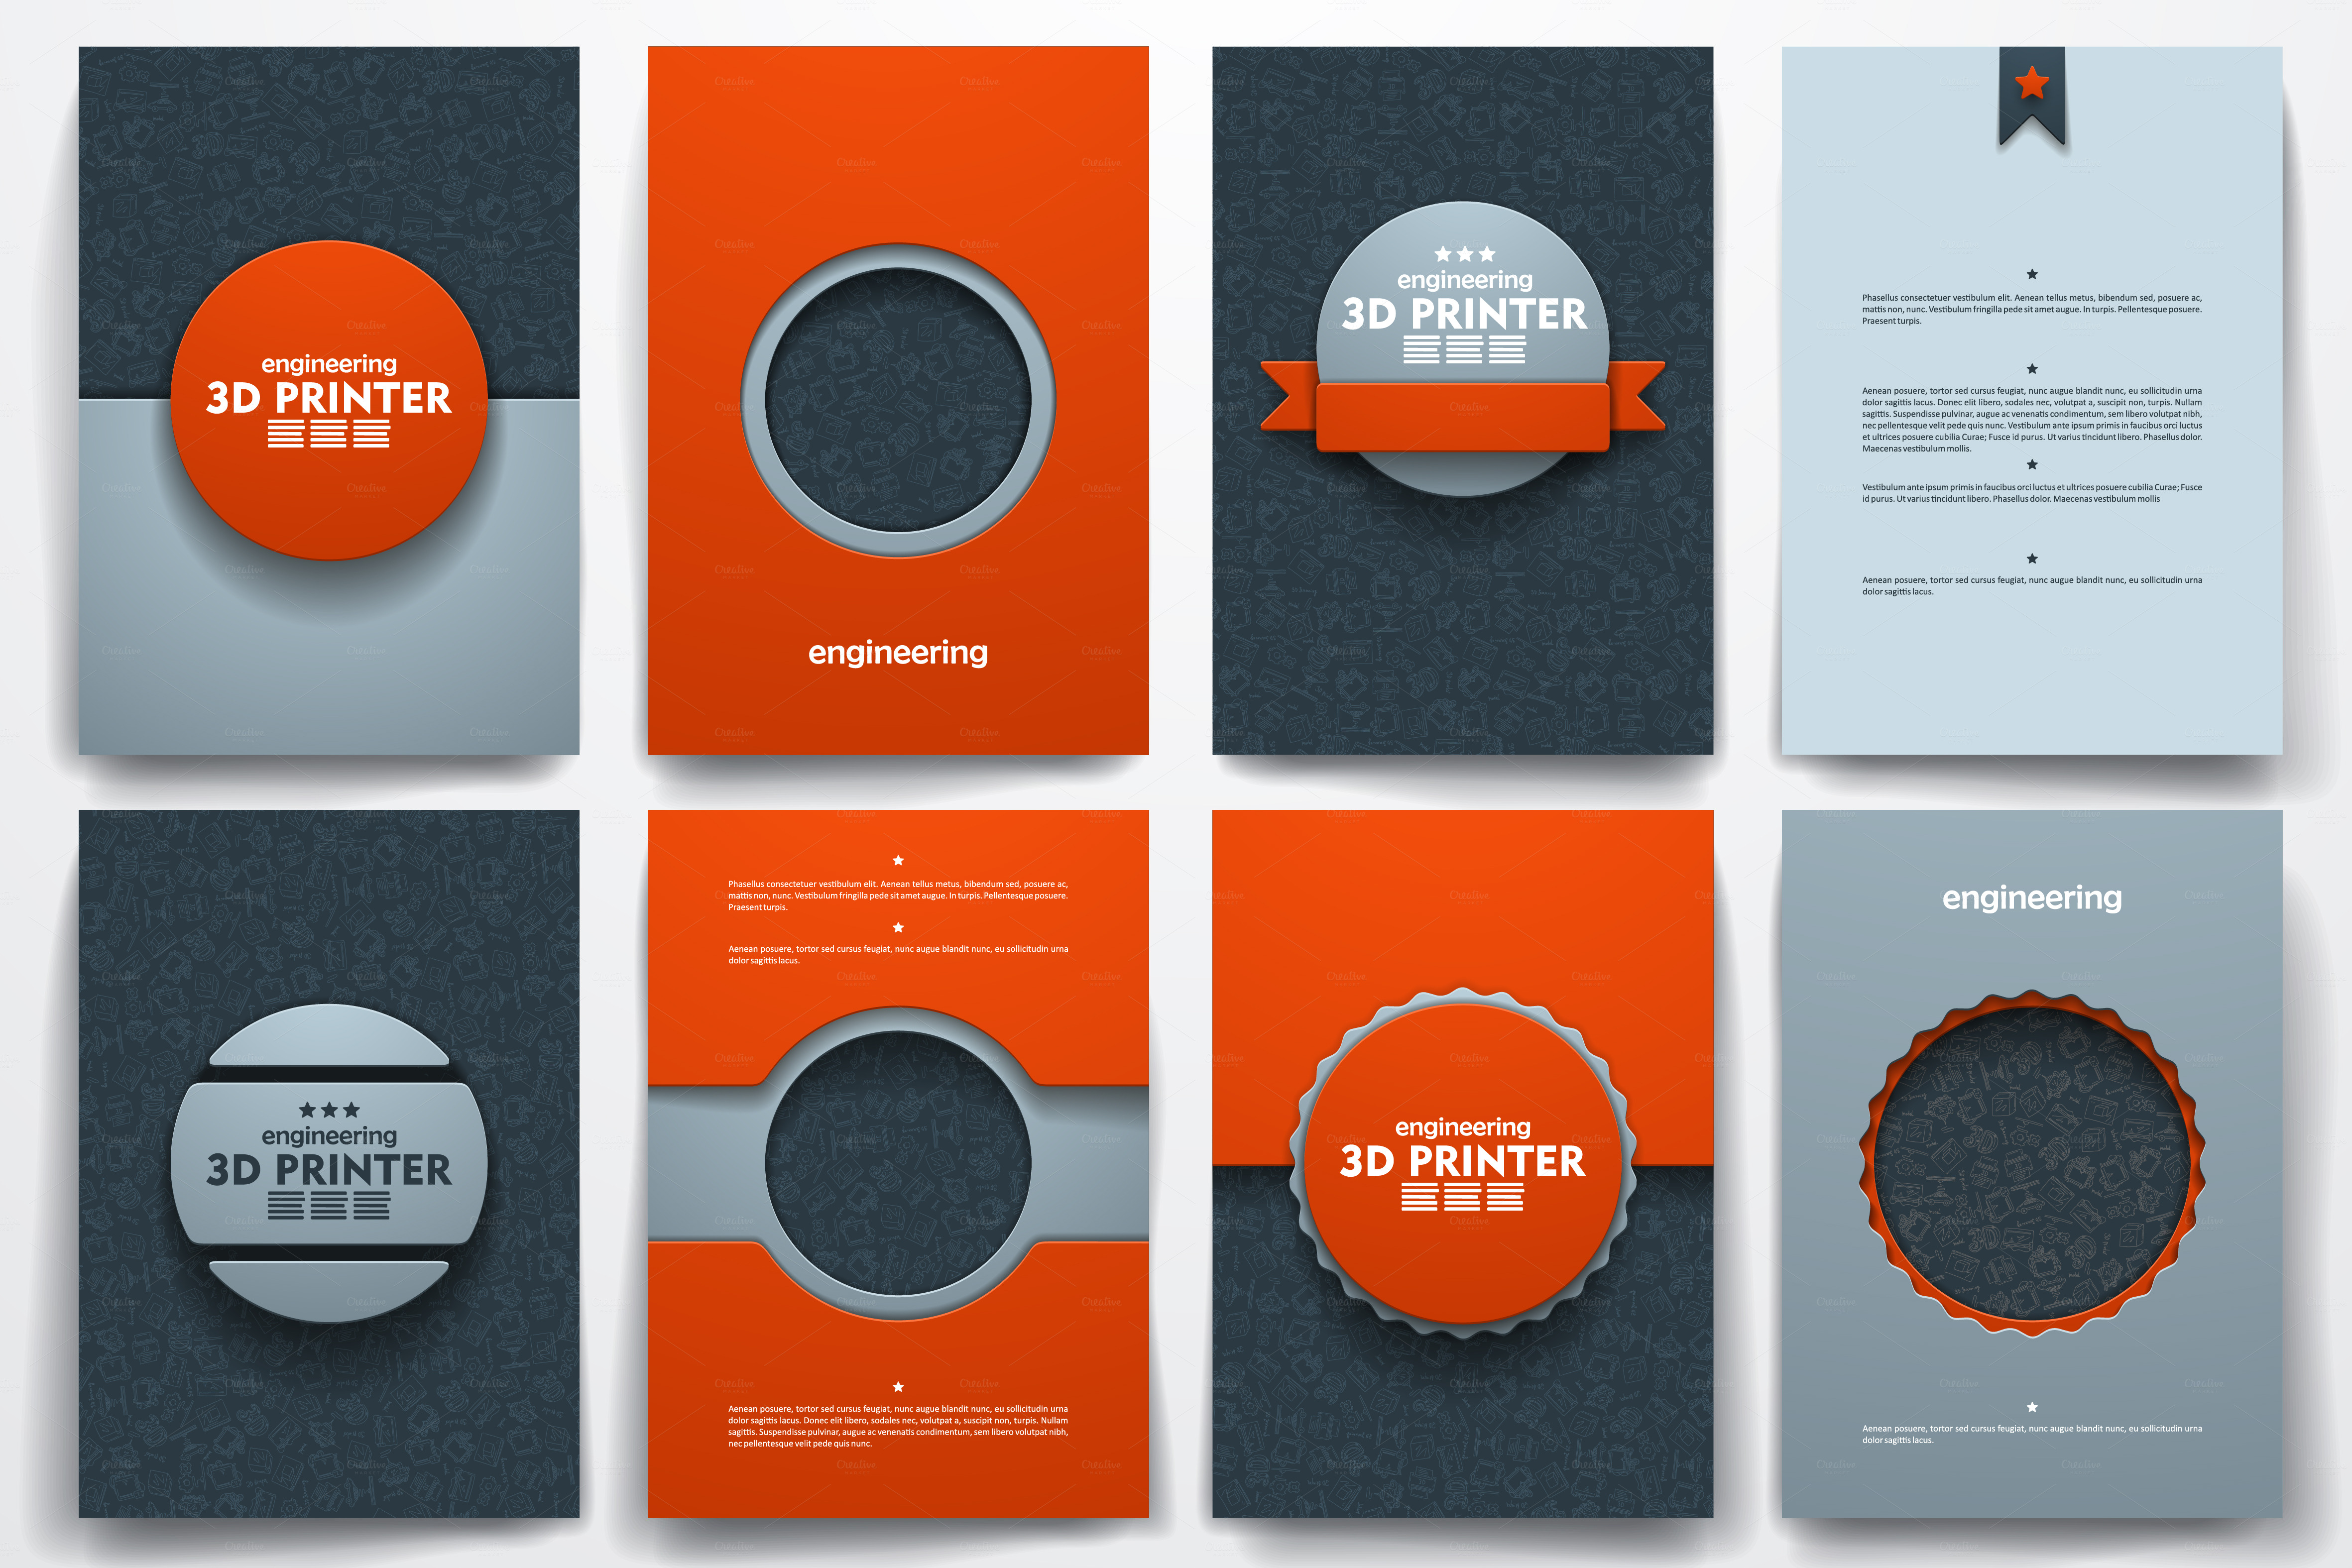 3d brochure design - templates on 3d printer theme brochure templates on